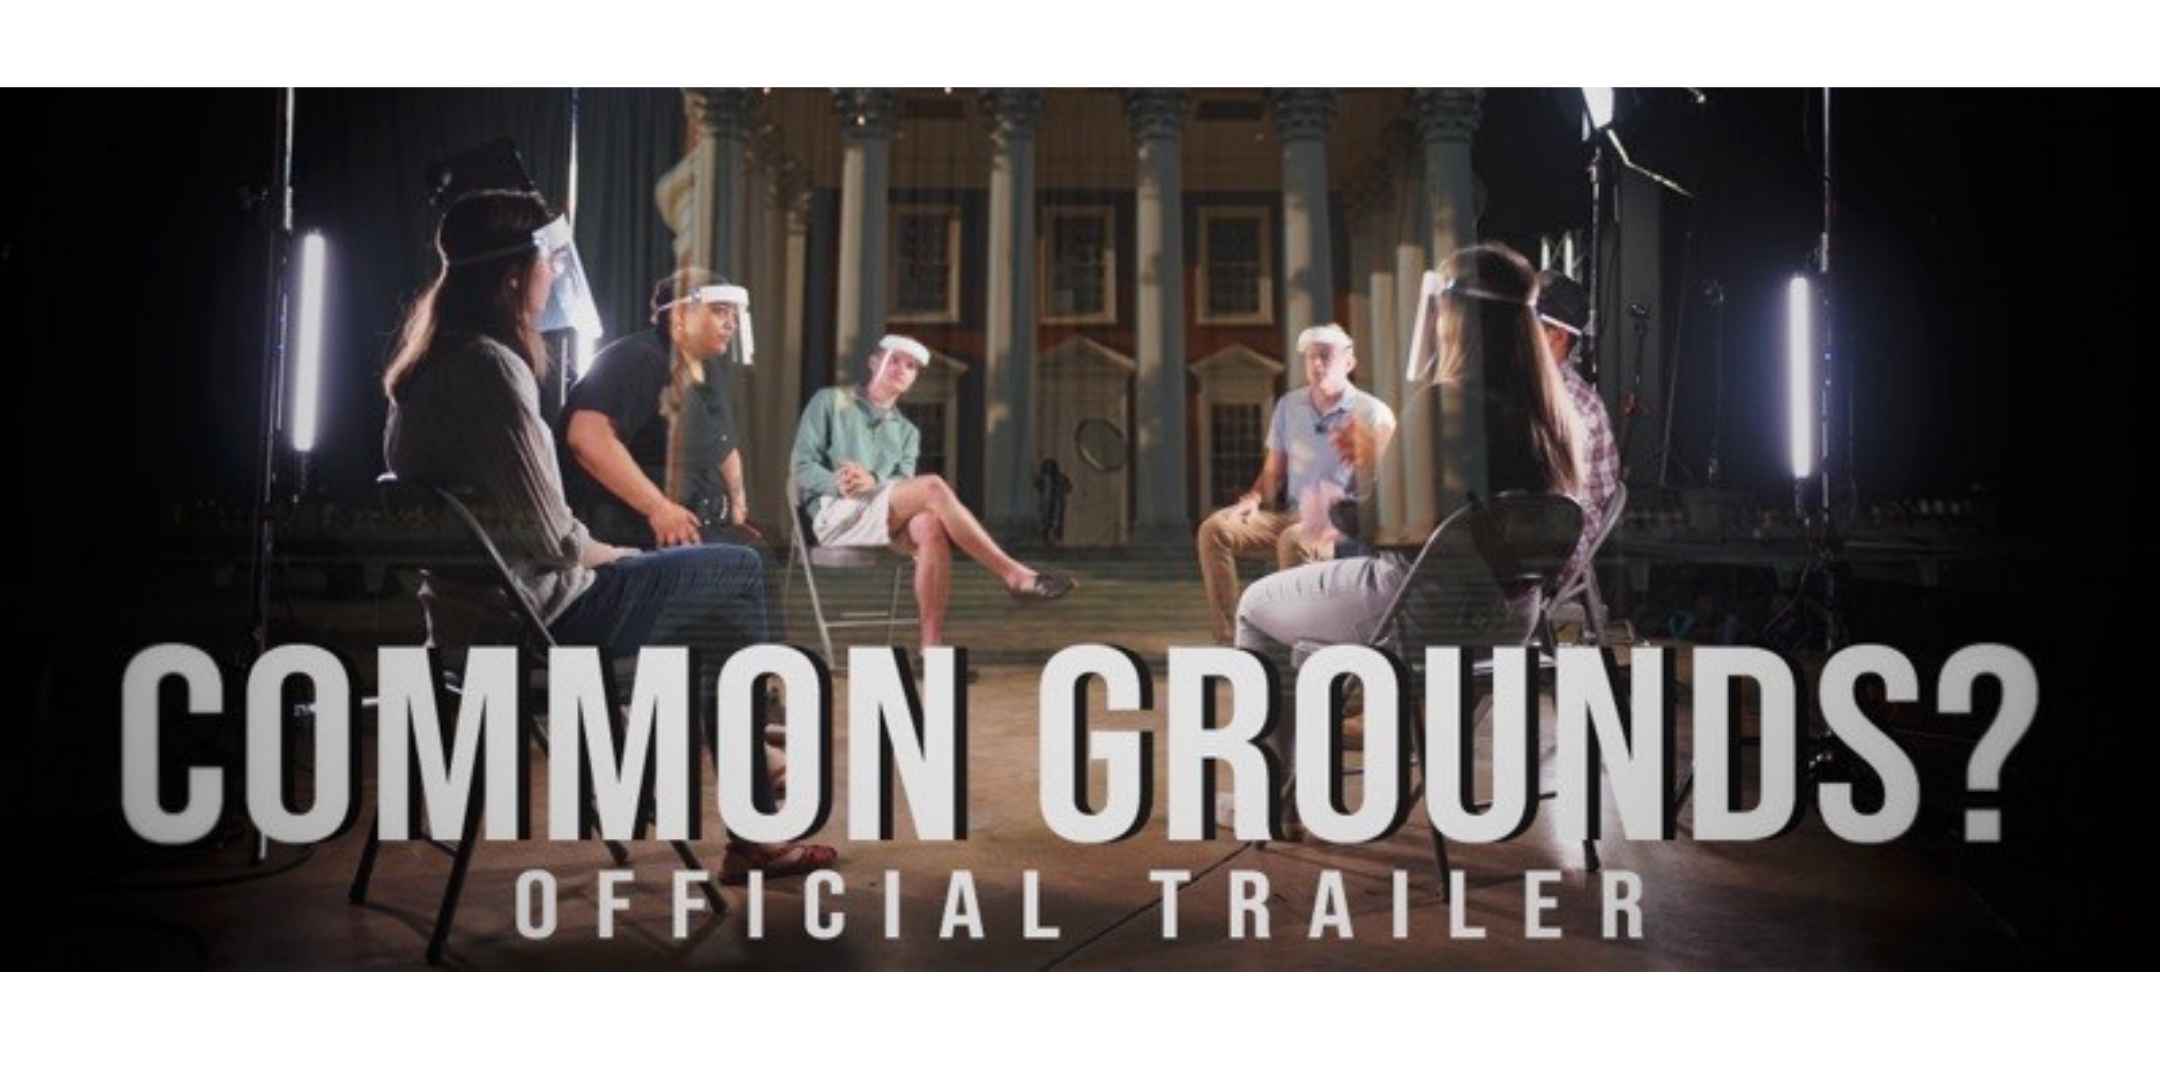 UVA Center for Politics Releases 'Common Grounds' Trailer